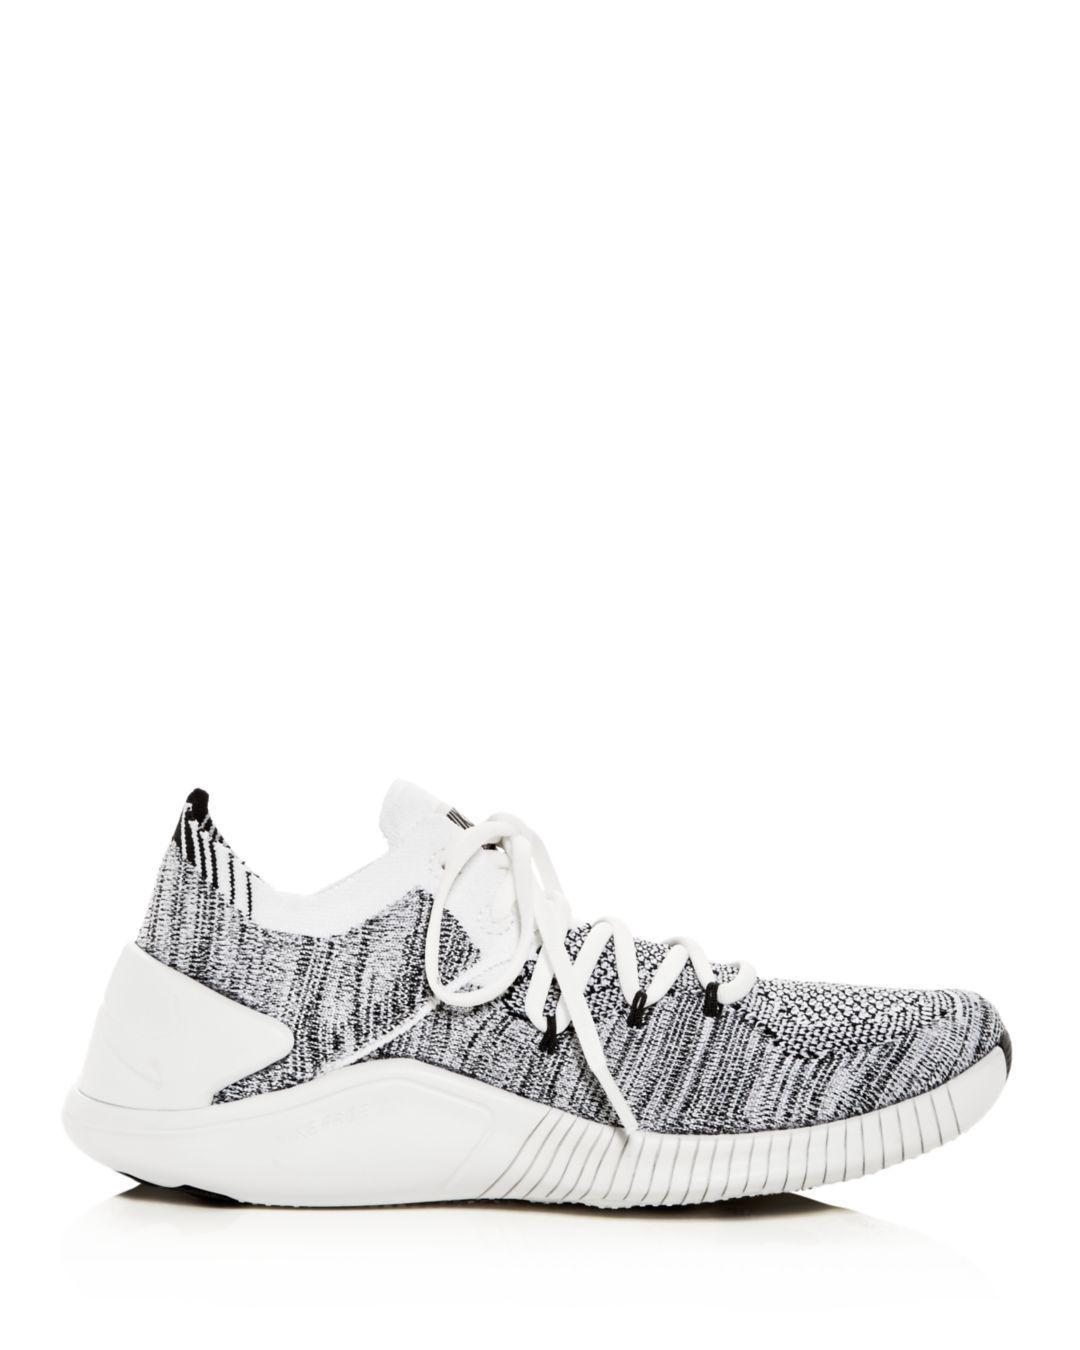 08f57d3ad1e4 Lyst - Nike Women s Free Tr 3 Flyknit Low-top Sneakers in White